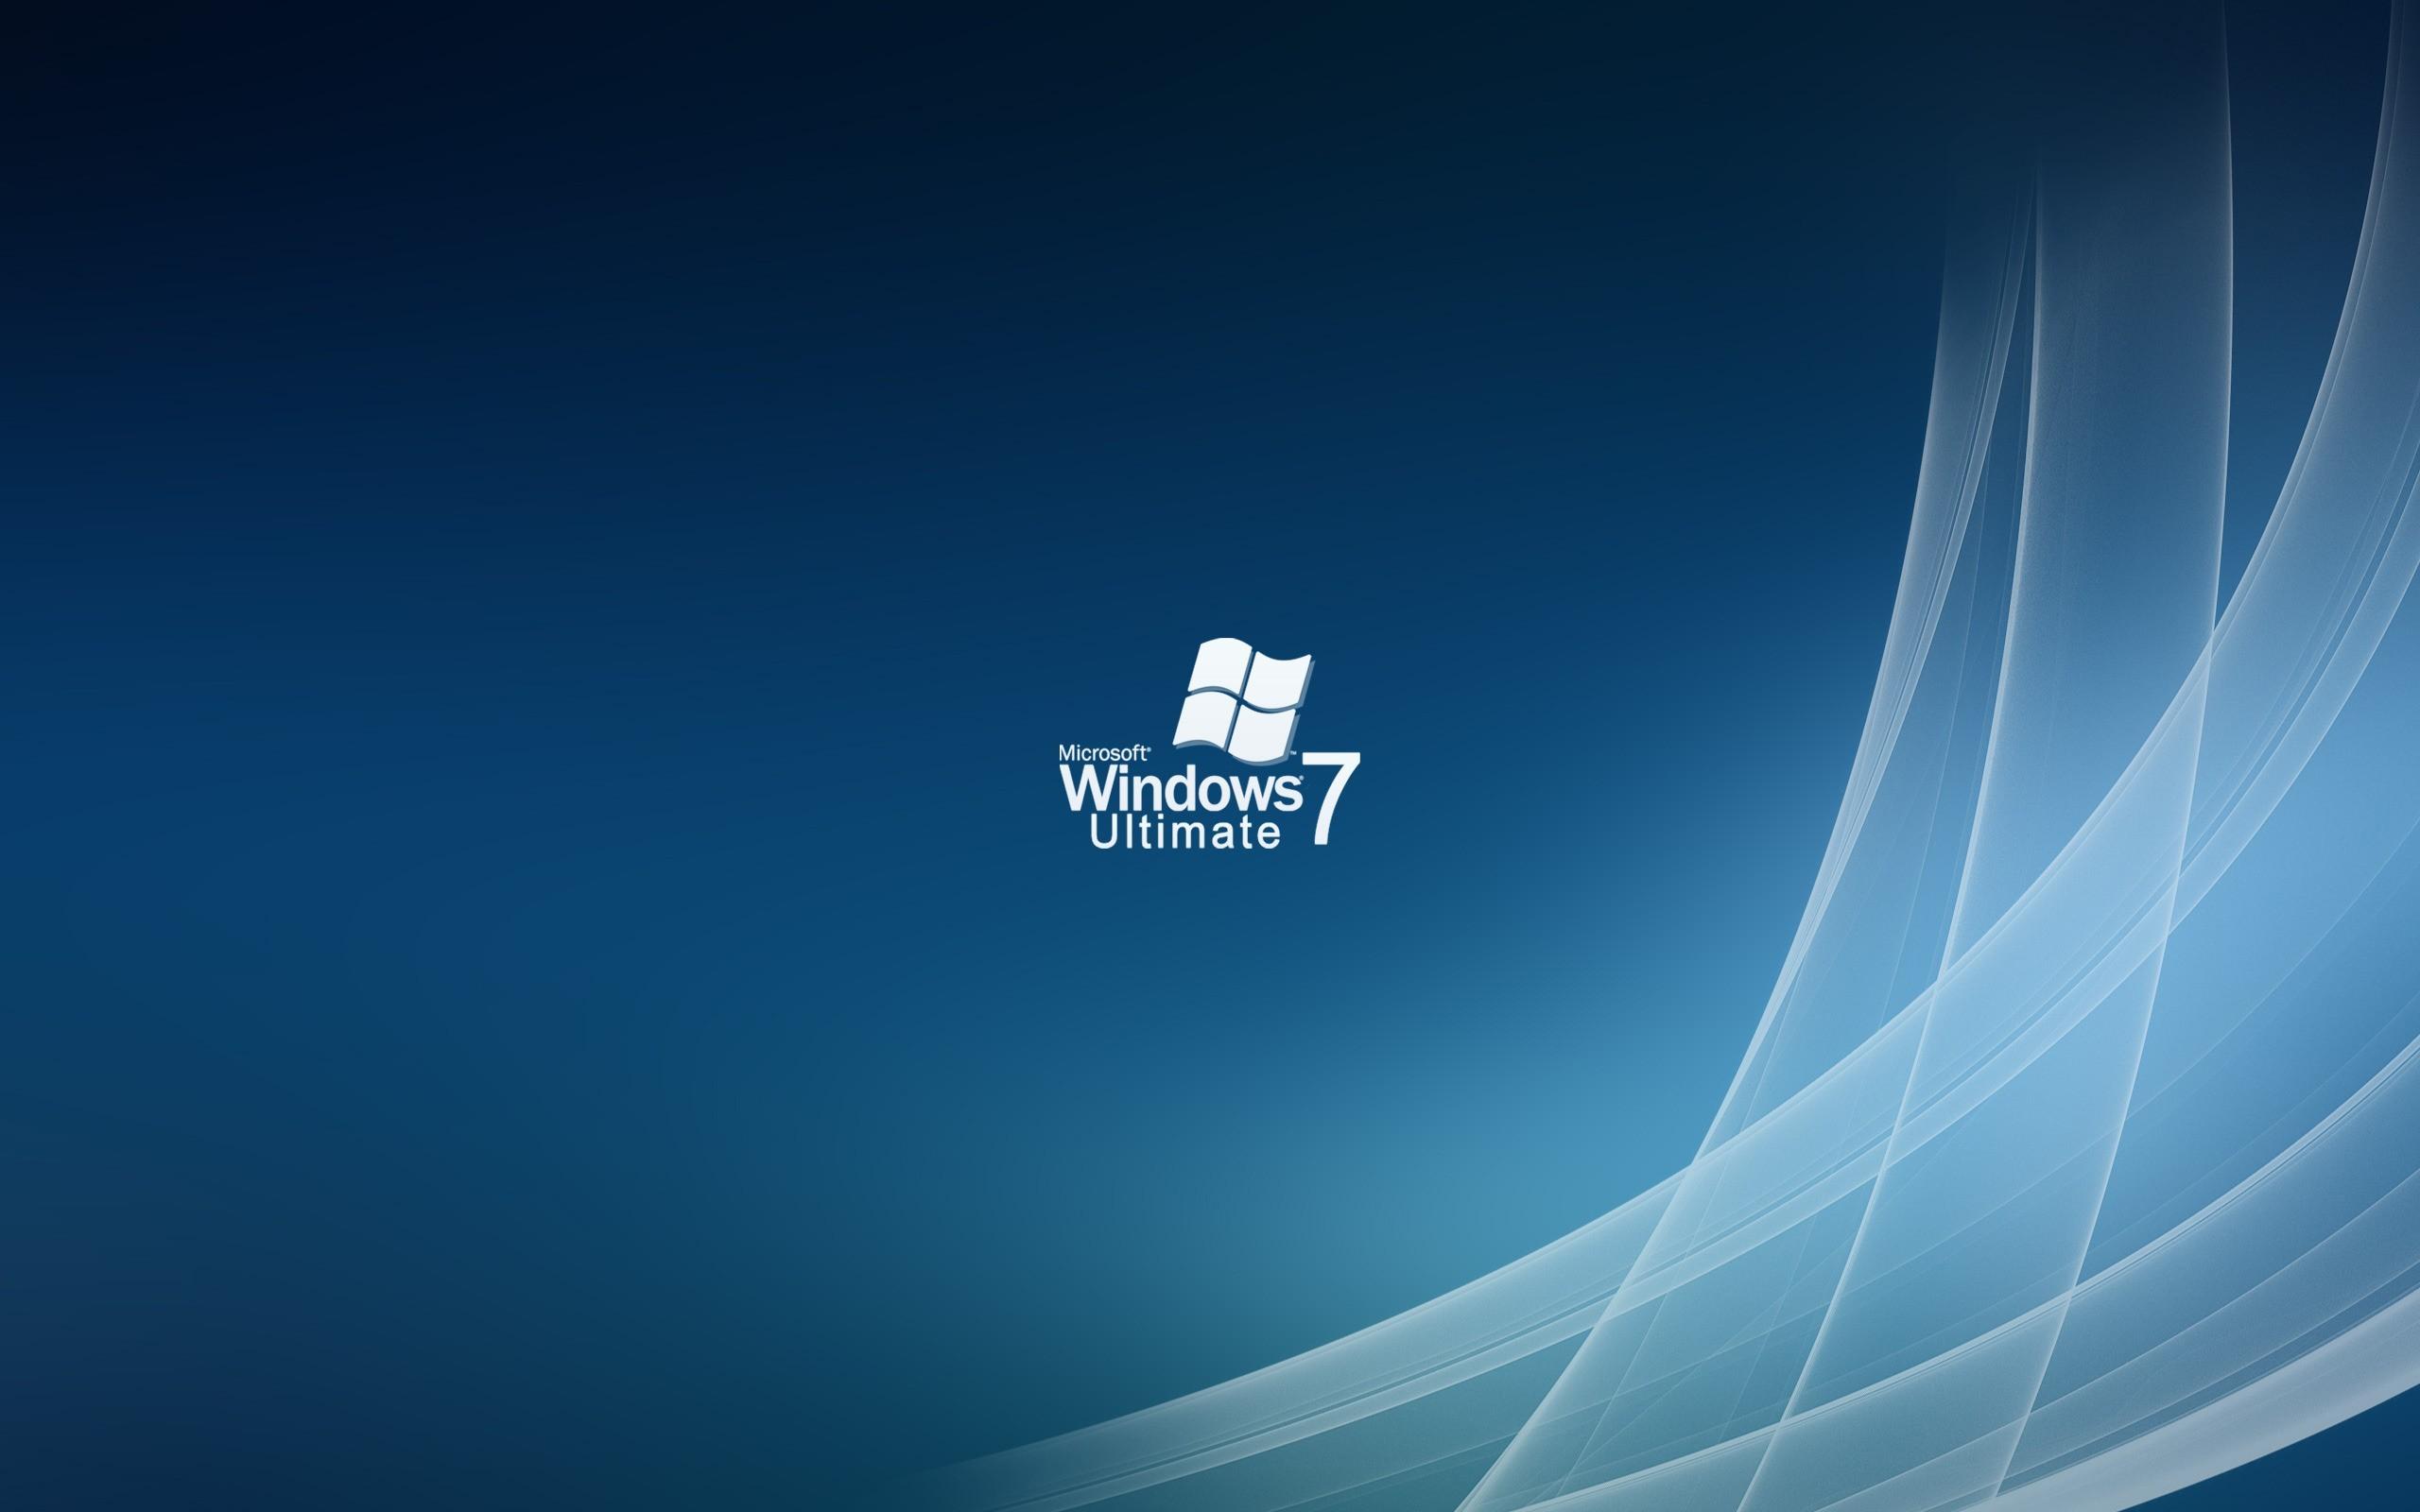 microsoft windows 7 desktop backgrounds 64 images